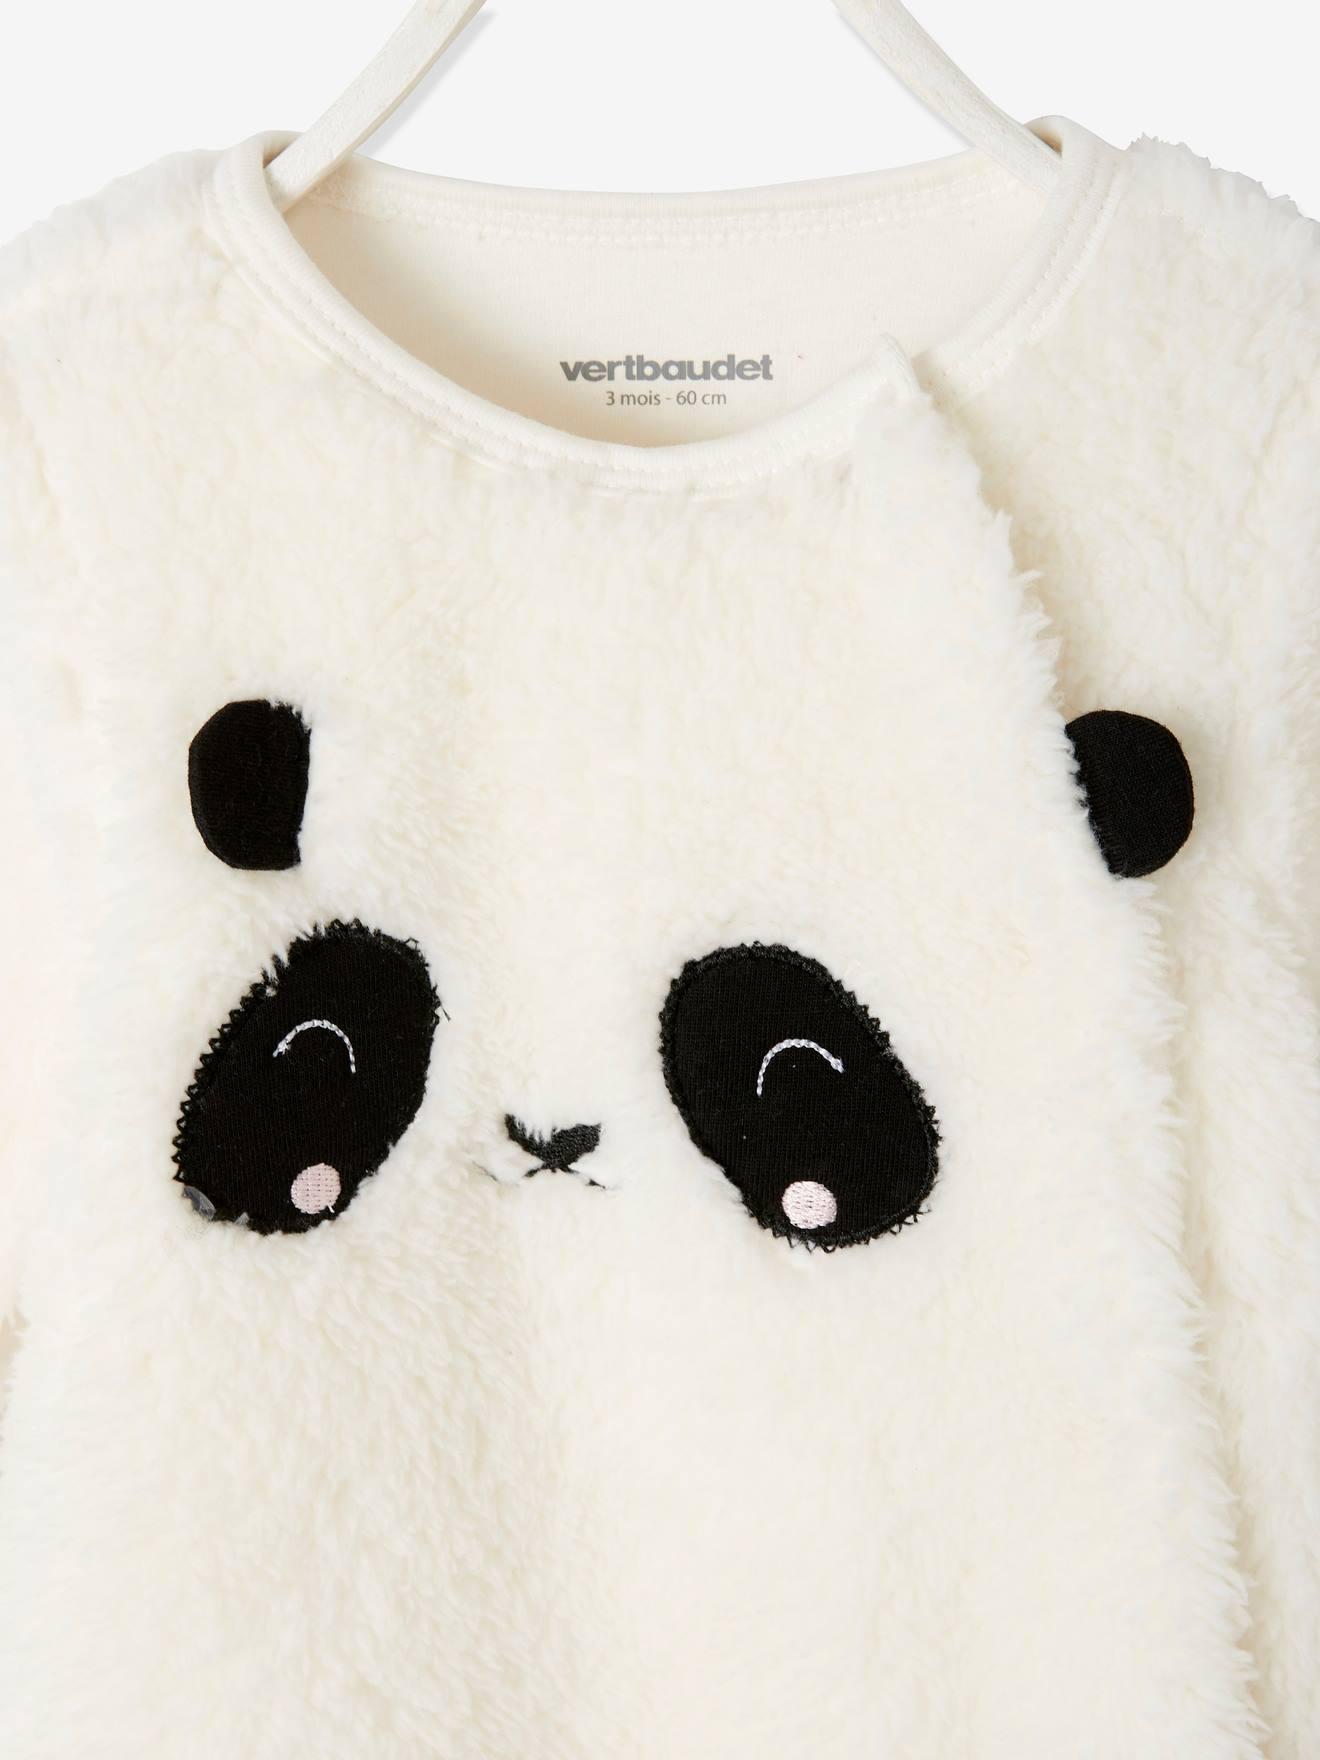 Vertbaudet Baby Overall Panda oder Maus Webpelz